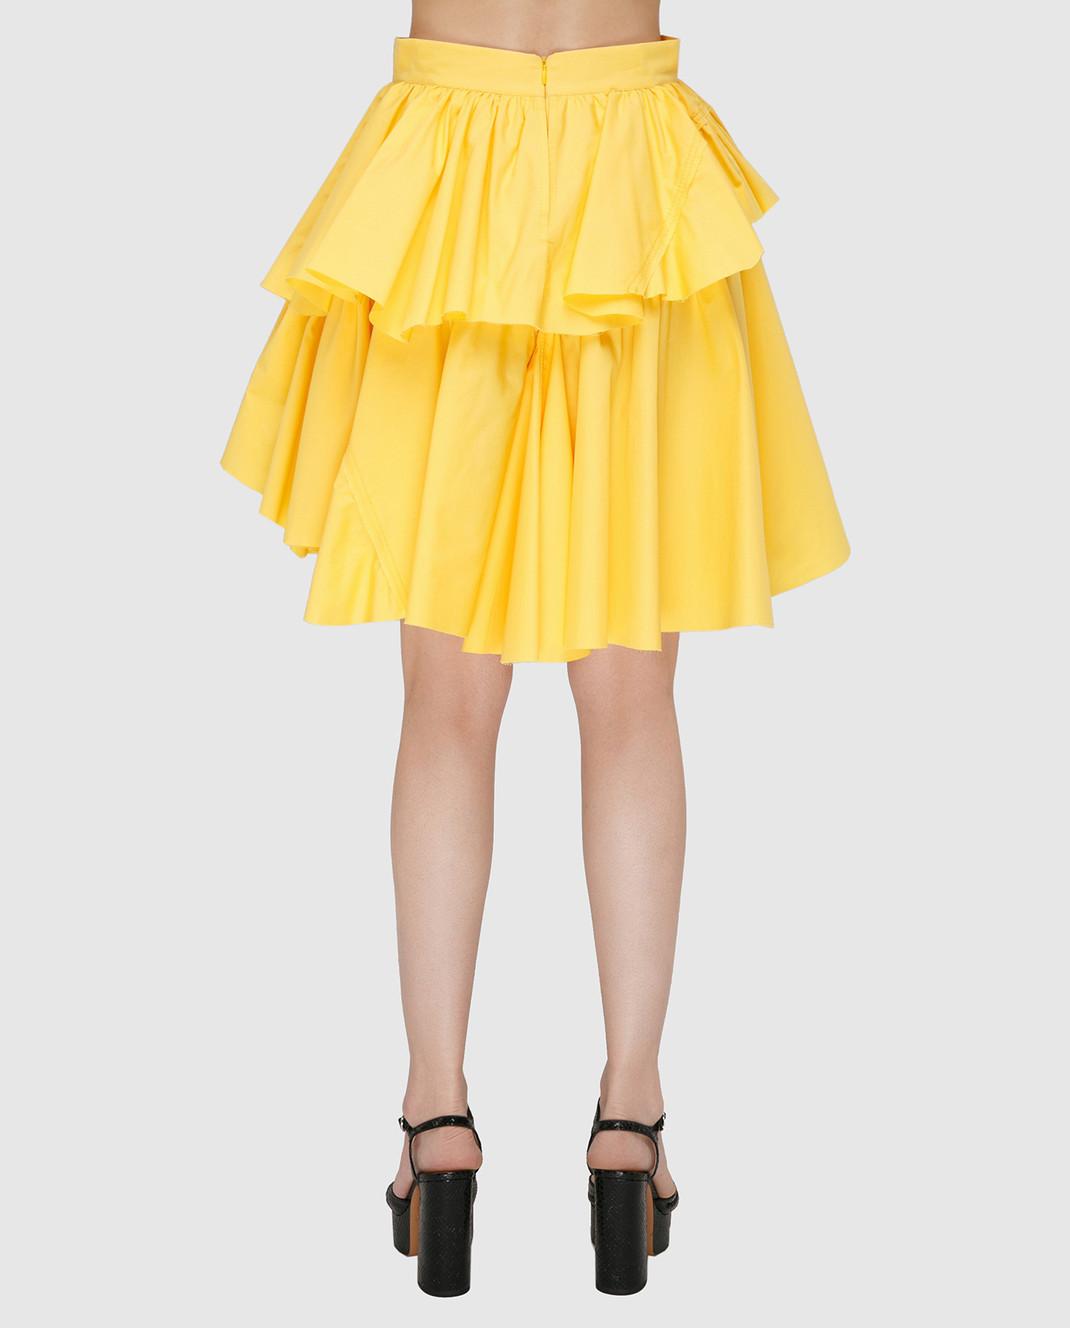 Philosophy di Lorenzo Serafini Желтая юбка A01042143 изображение 4